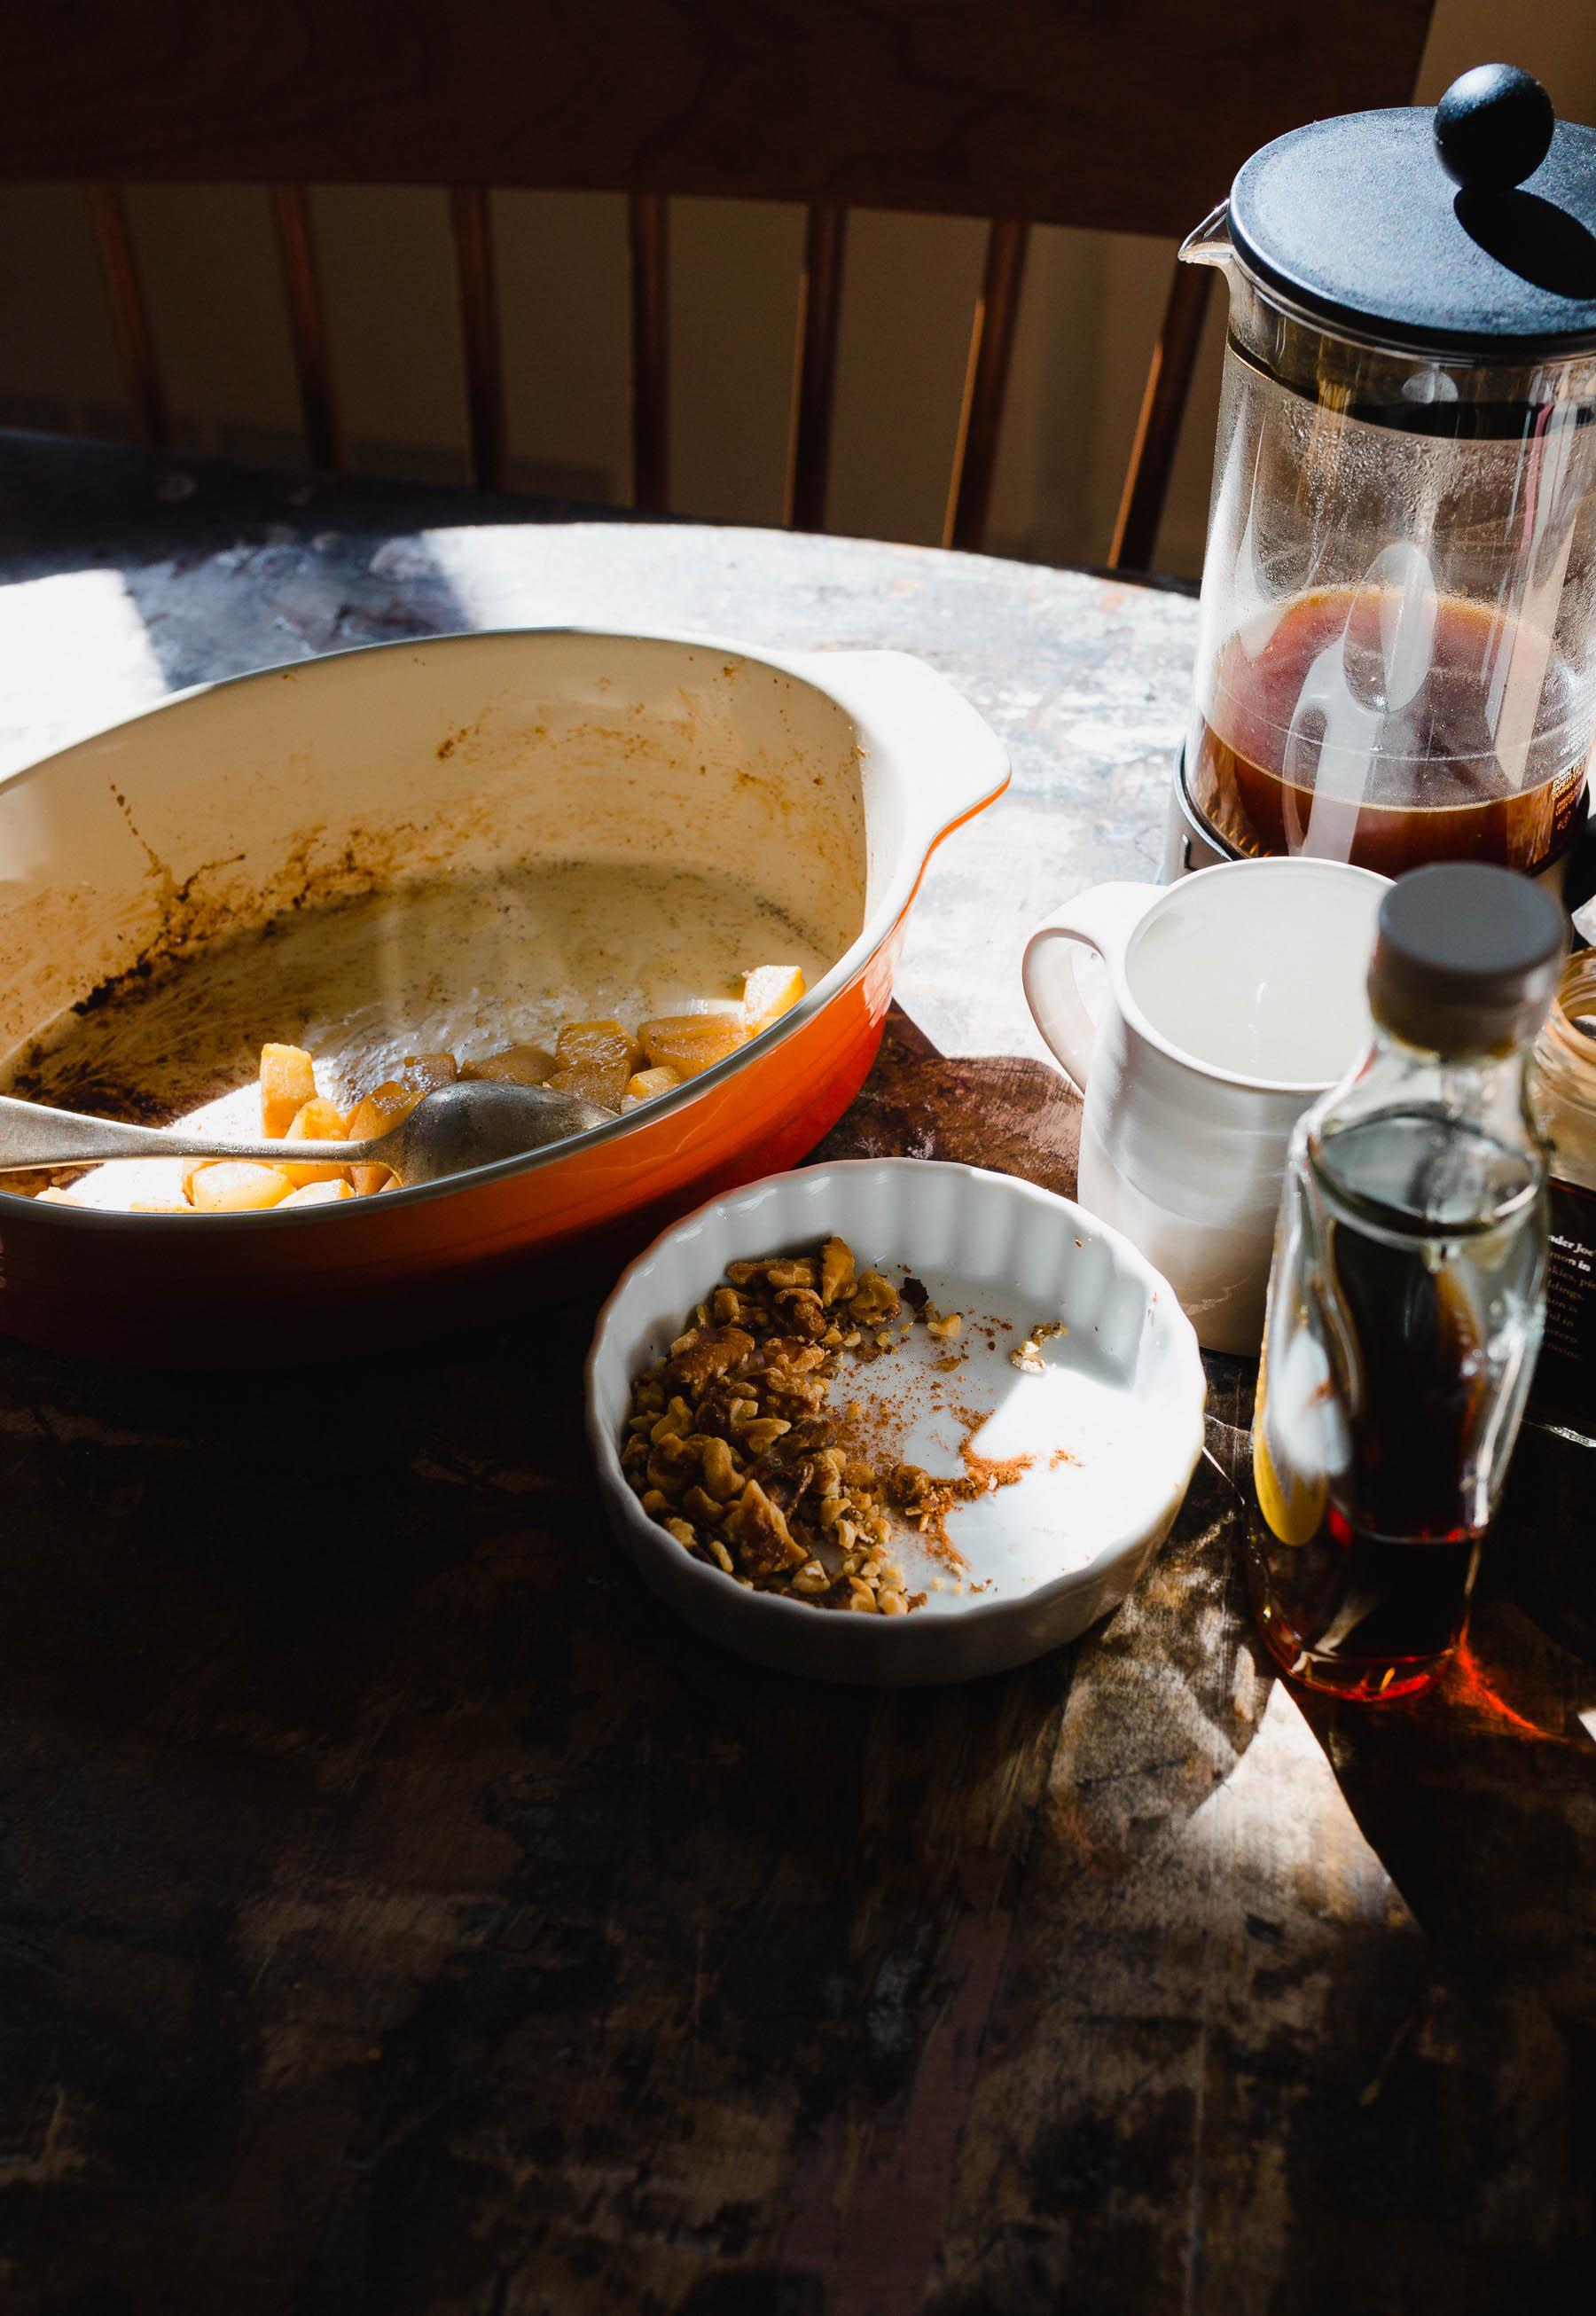 chicago-nyc-food-lifestyle-photographer-27.jpg